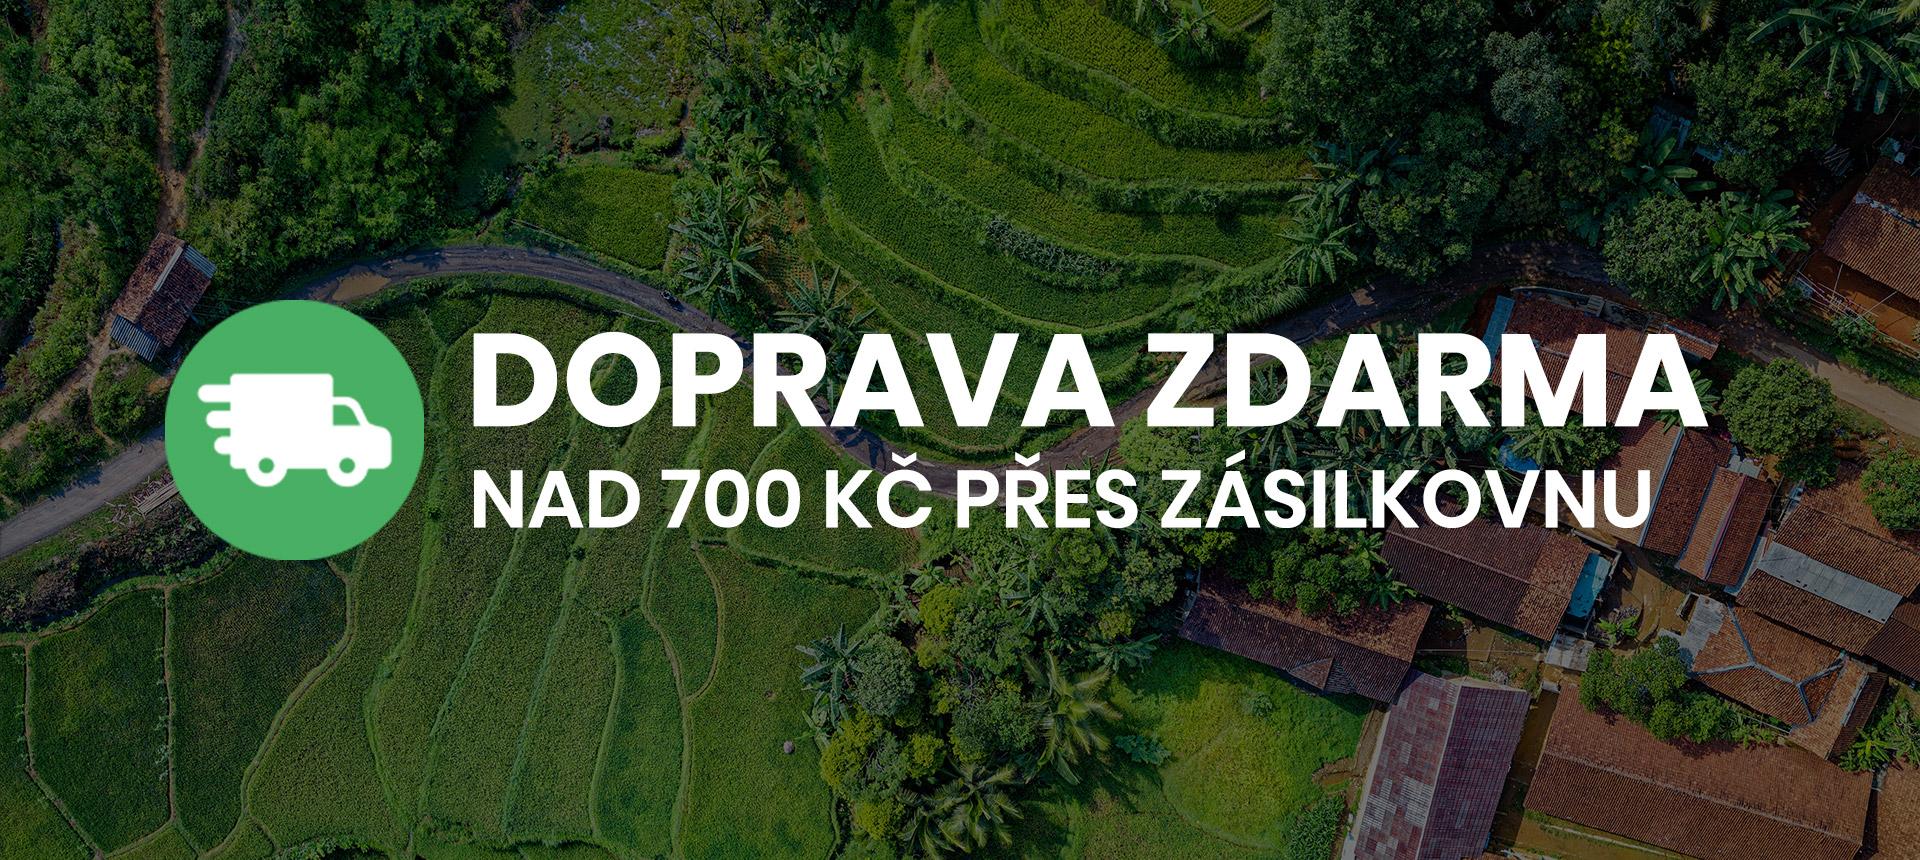 Banner_kratomit.cz_doprava zdarma